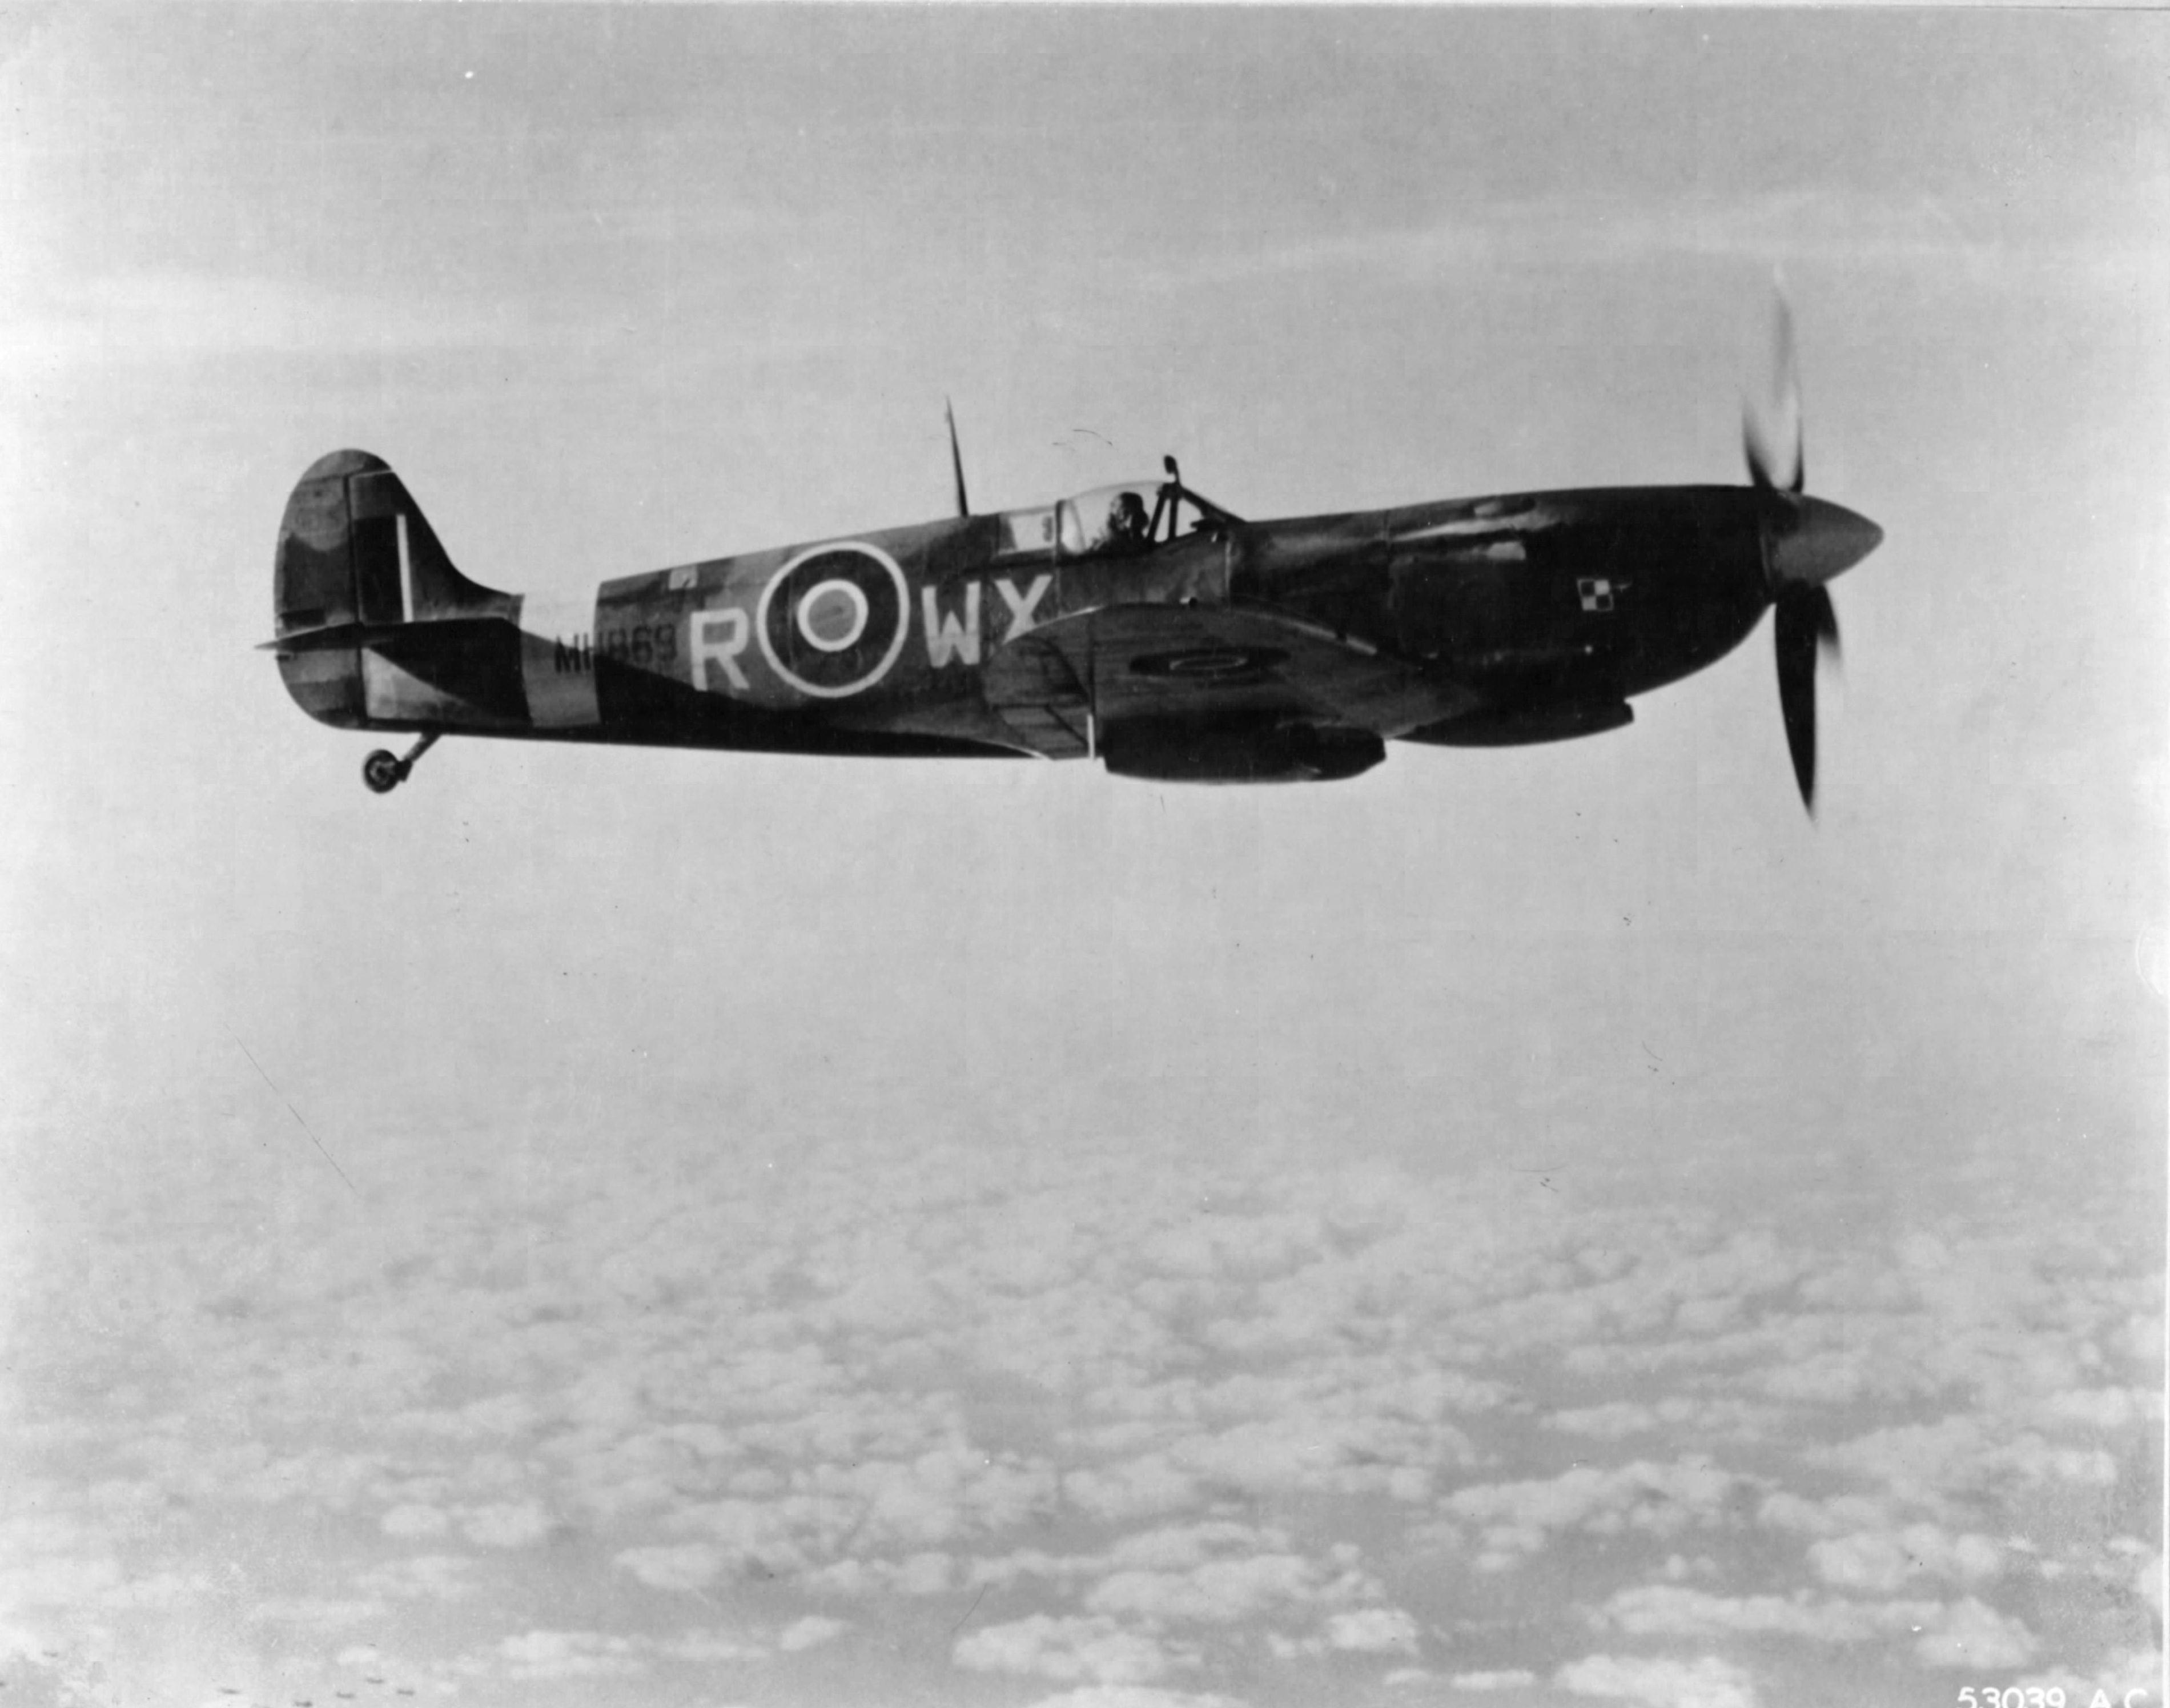 Spitfire MkIX RAF 302Sqn WXR MH869 escorts 8AF B 17 Fortress over France early 1944 04